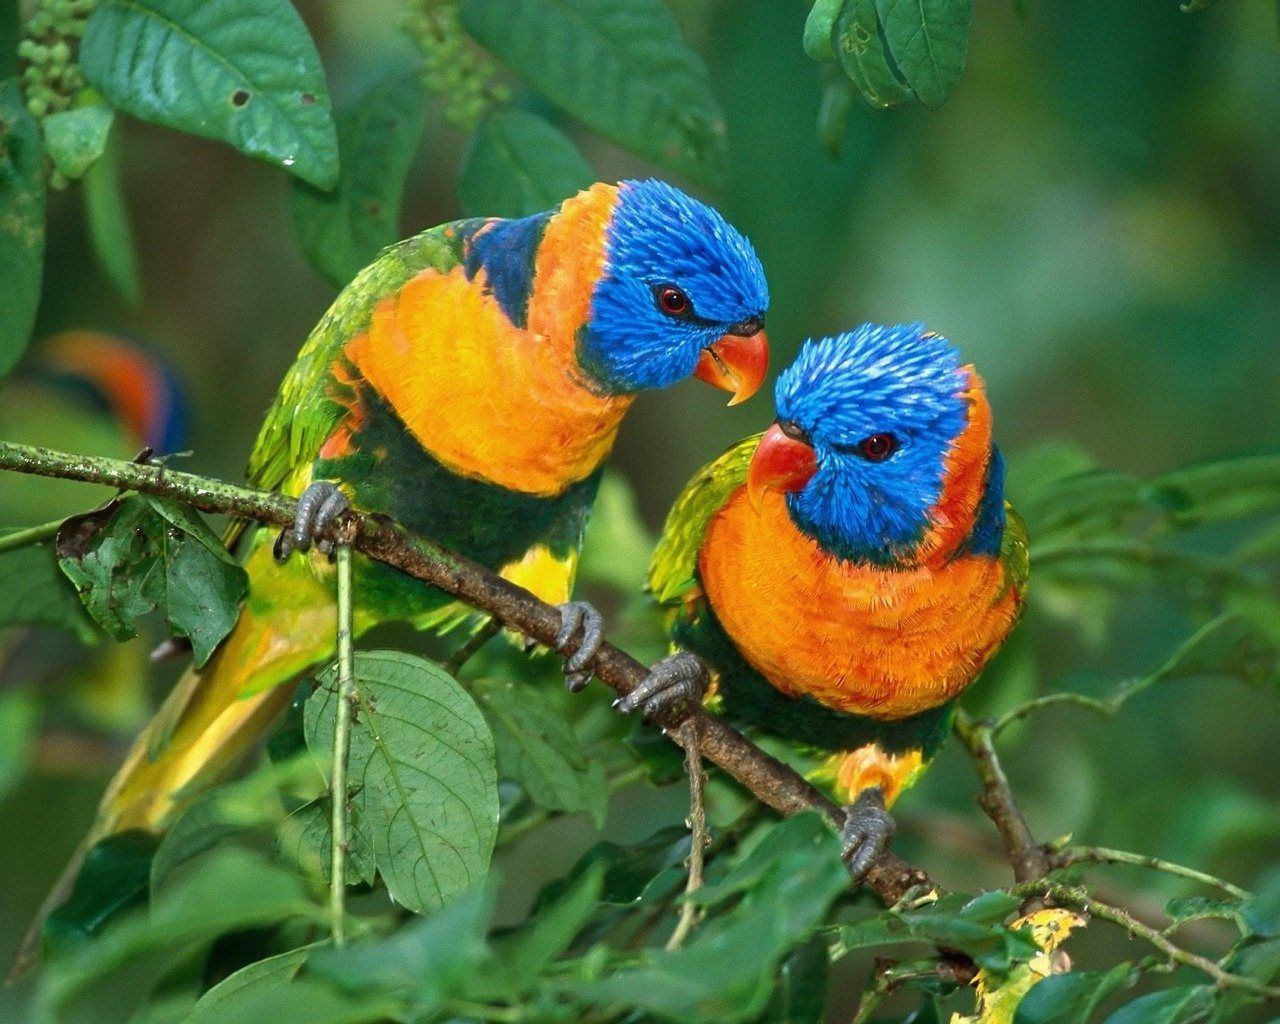 Love Birds Pictures Cute Lovebird Wallpapers In Hd Beautiful Bird Wallpaper Most Beautiful Birds Rare Birds